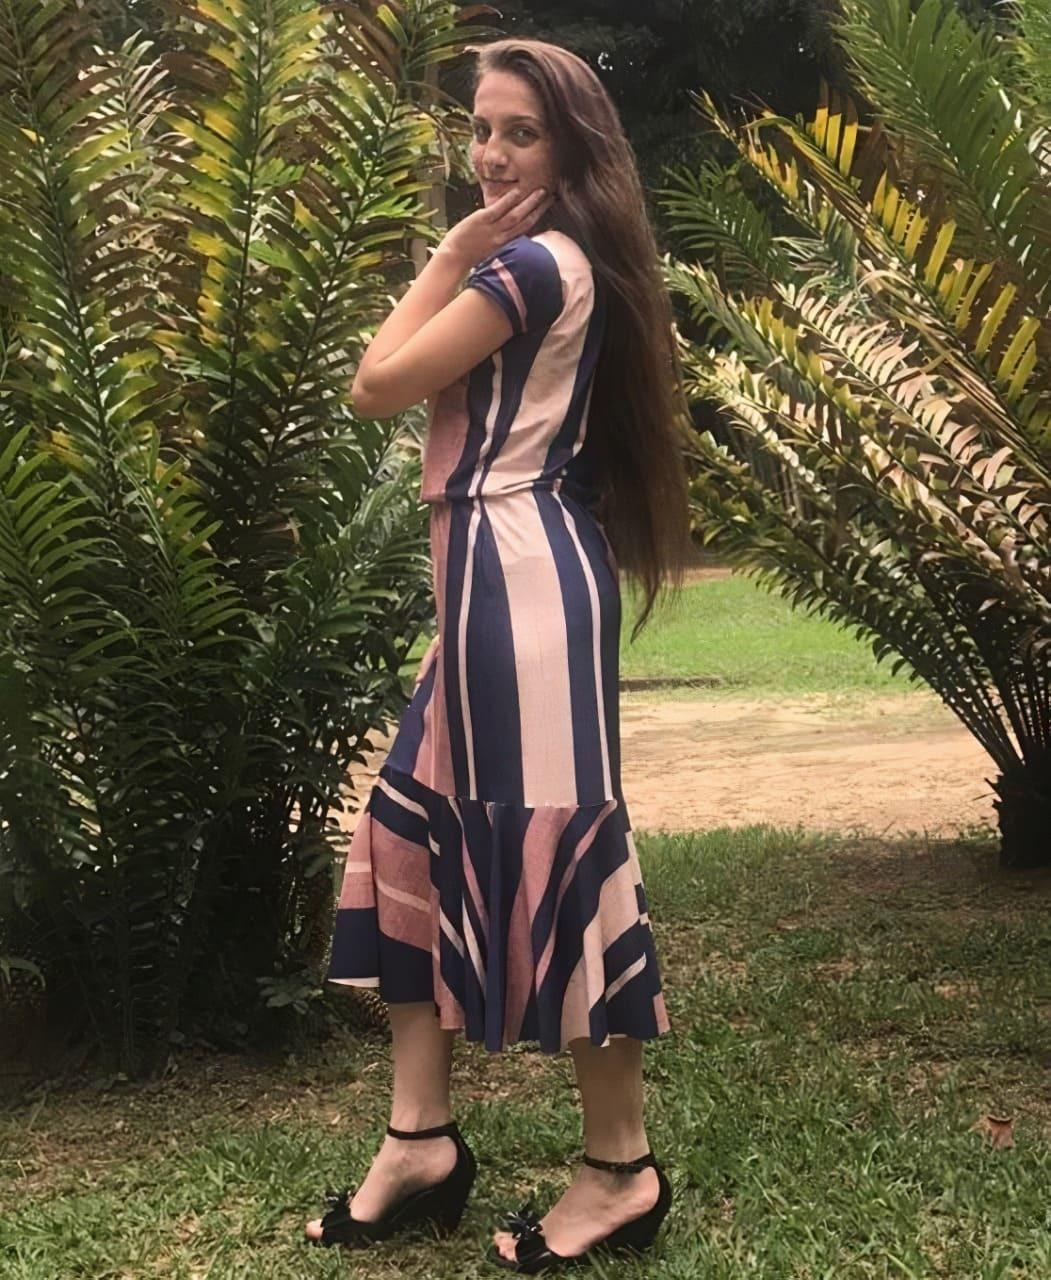 Vestido Feminino Evangelico Midi Justo Moda Babado Peplum